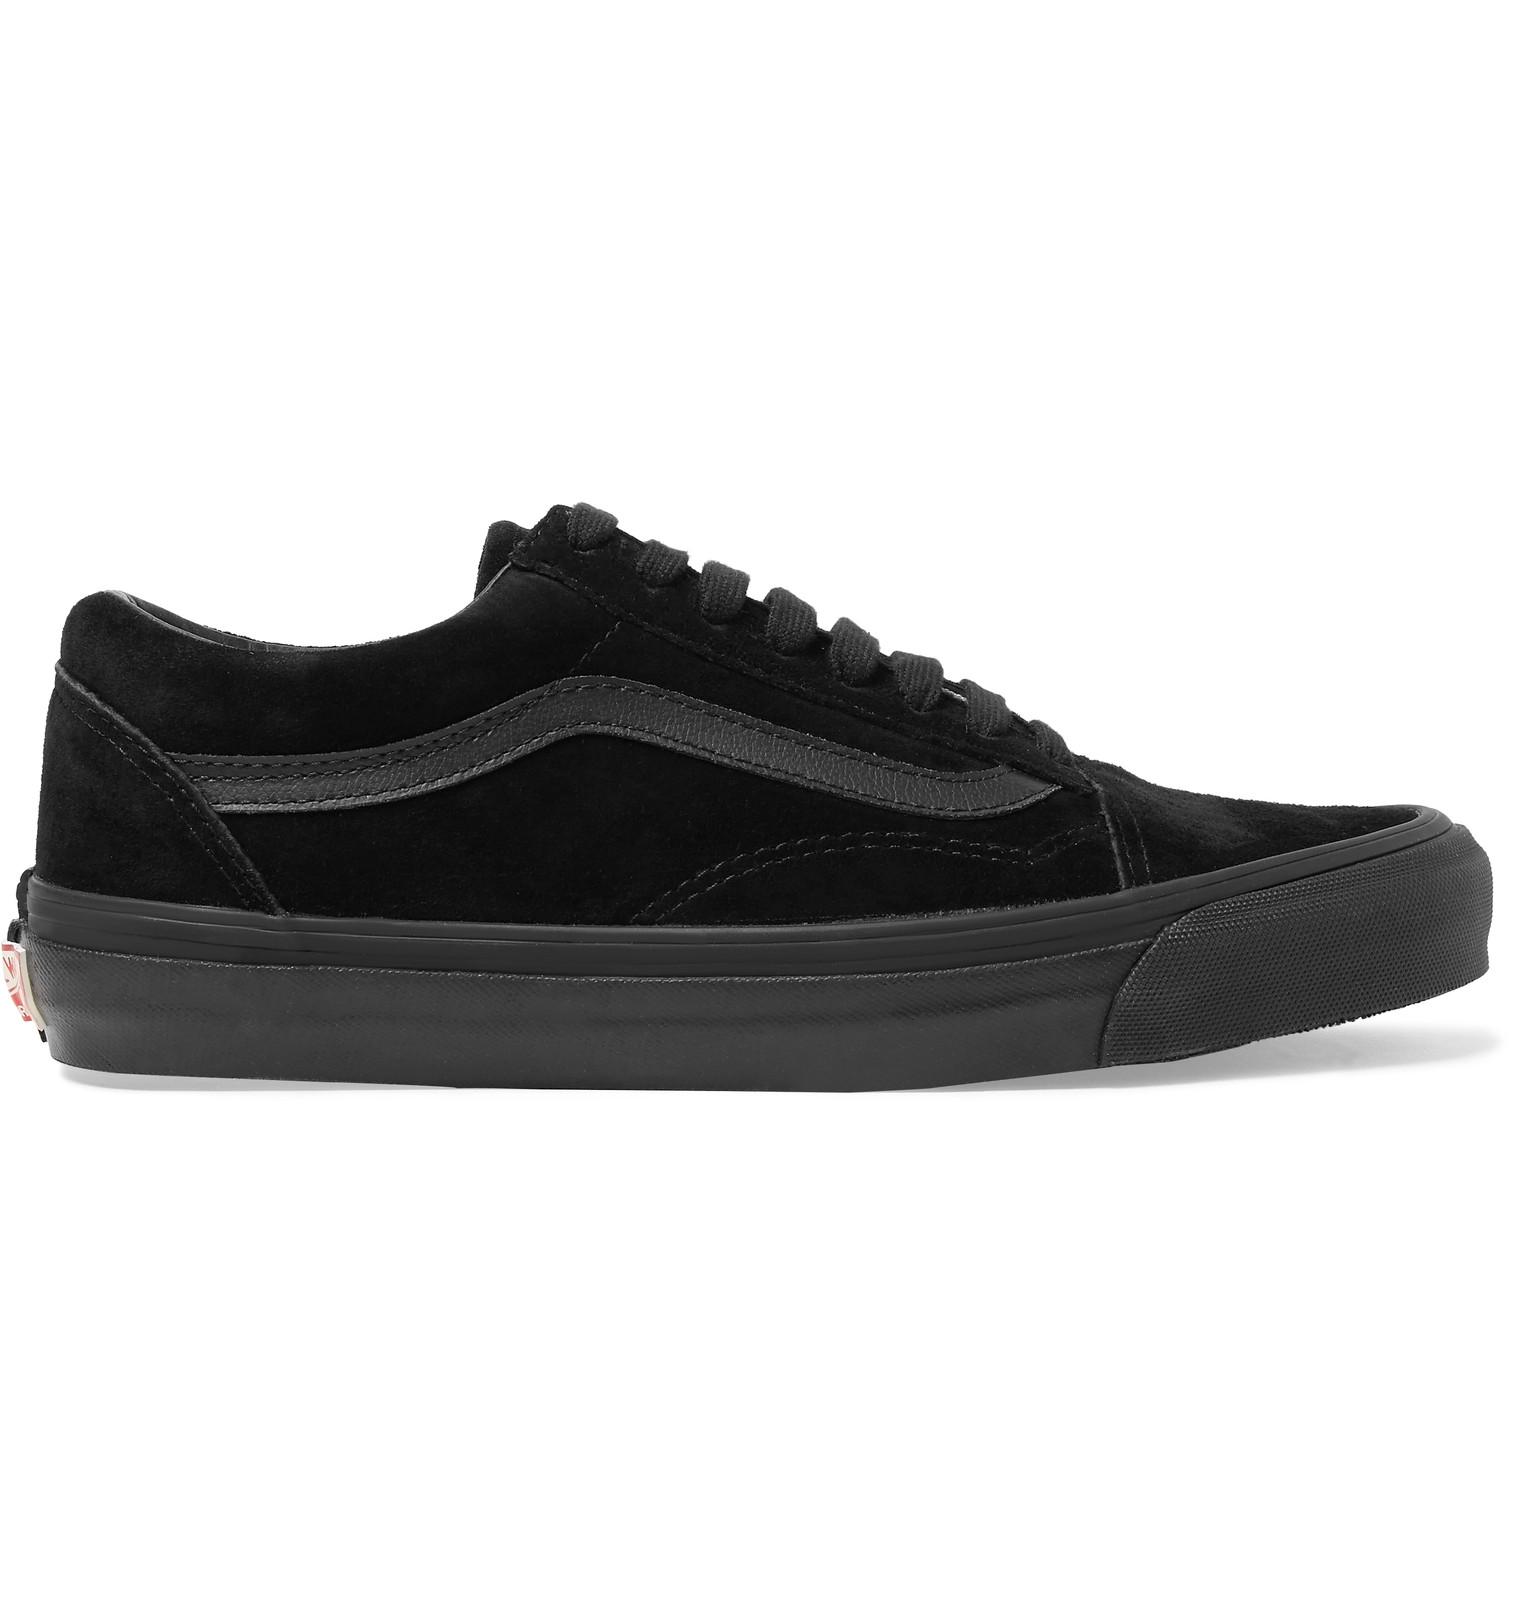 ae24210c6a62ef Vans - OG Old Skool LX Leather-Trimmed Suede Sneakers